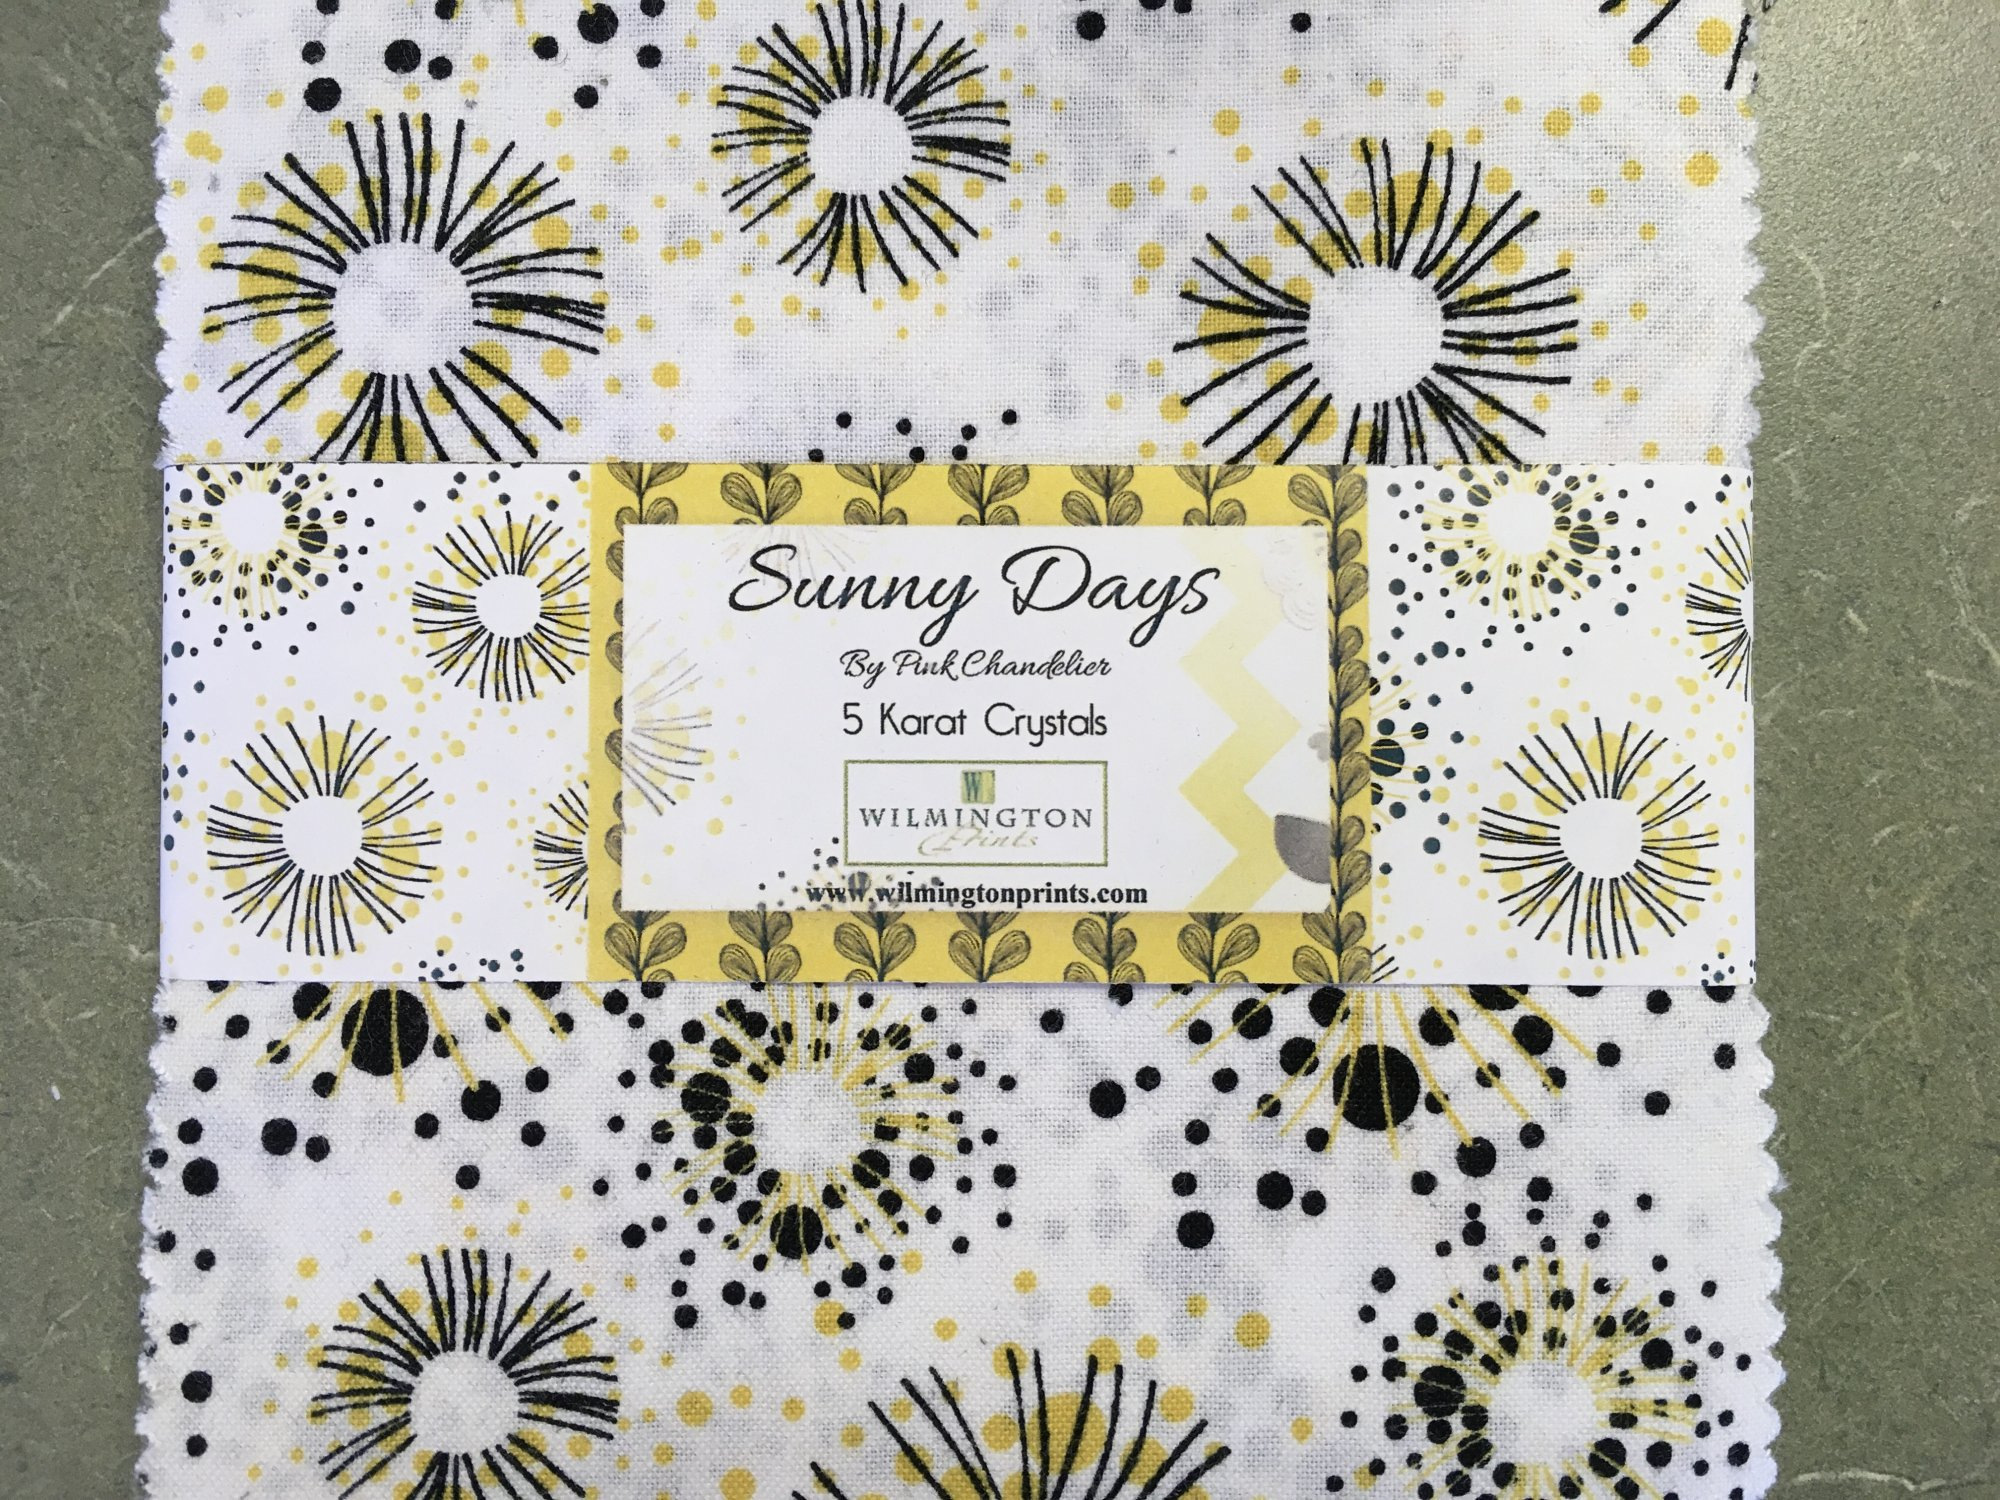 Sunny Days 5 Karat Crystals 5 inch Squares